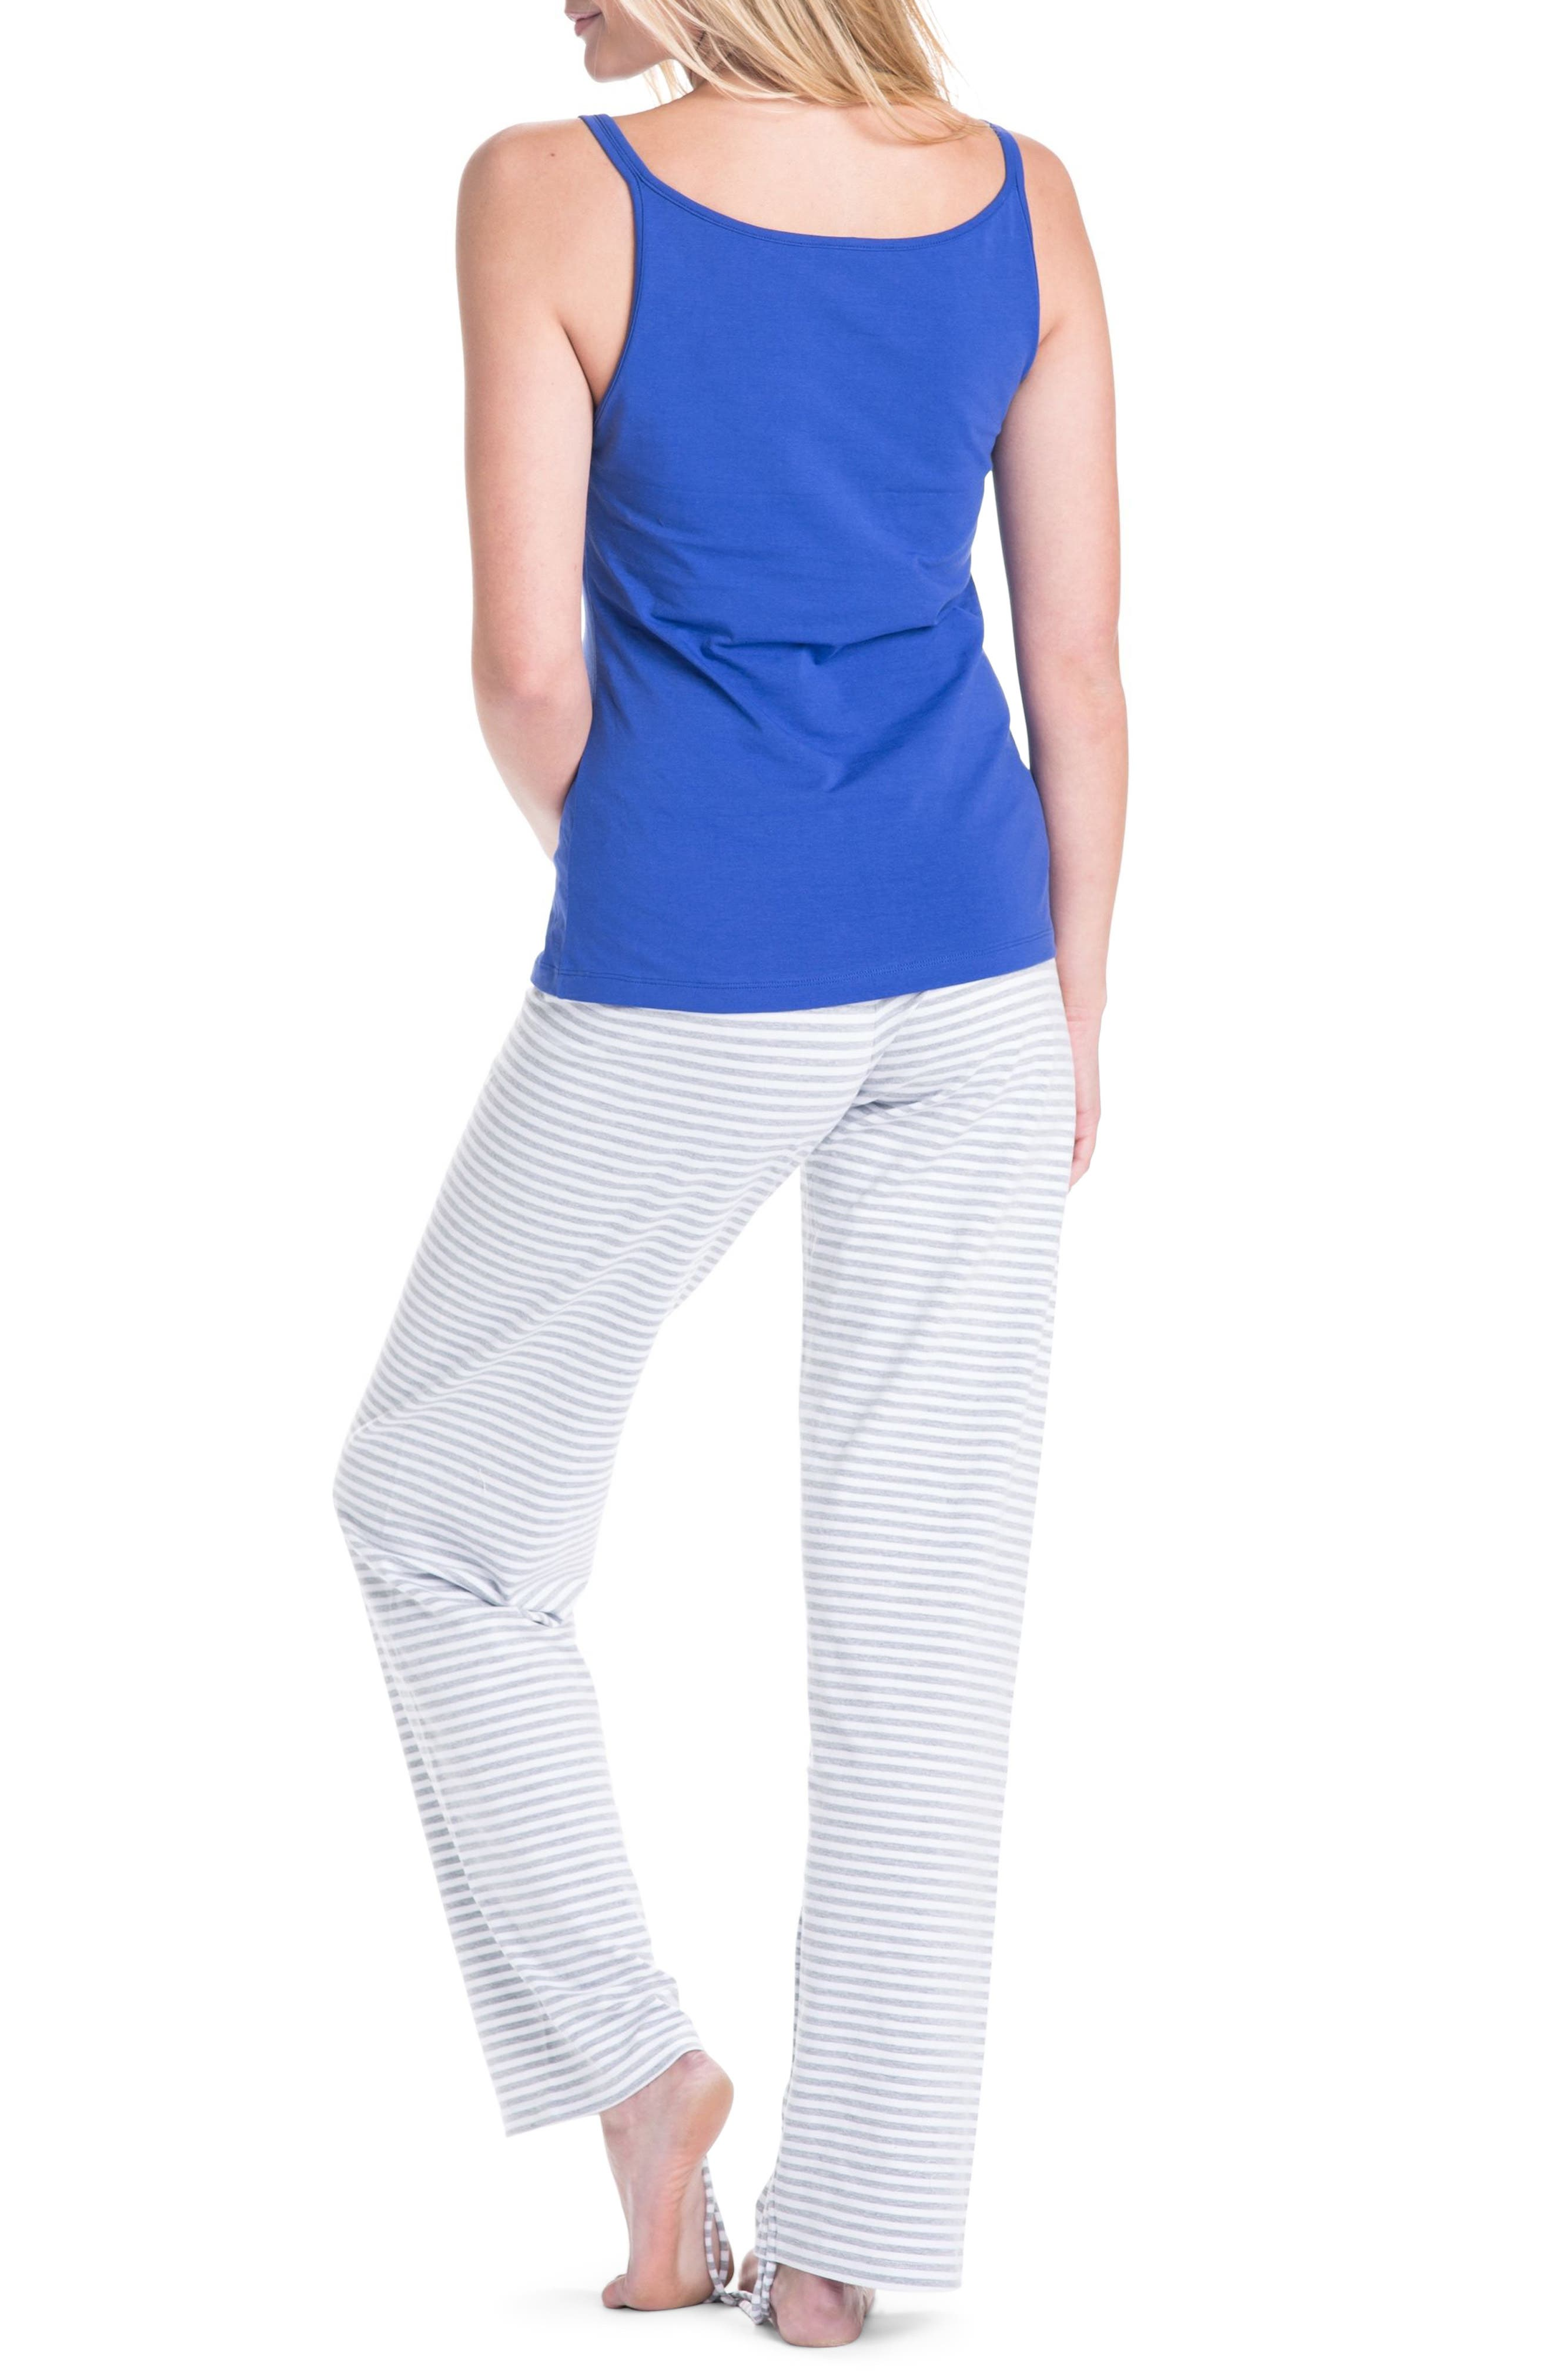 Trudy Super Mom Maternity/Nursing Pajamas,                             Alternate thumbnail 2, color,                             NAVY BLUE/ GRAY/ WHITE STRIPES